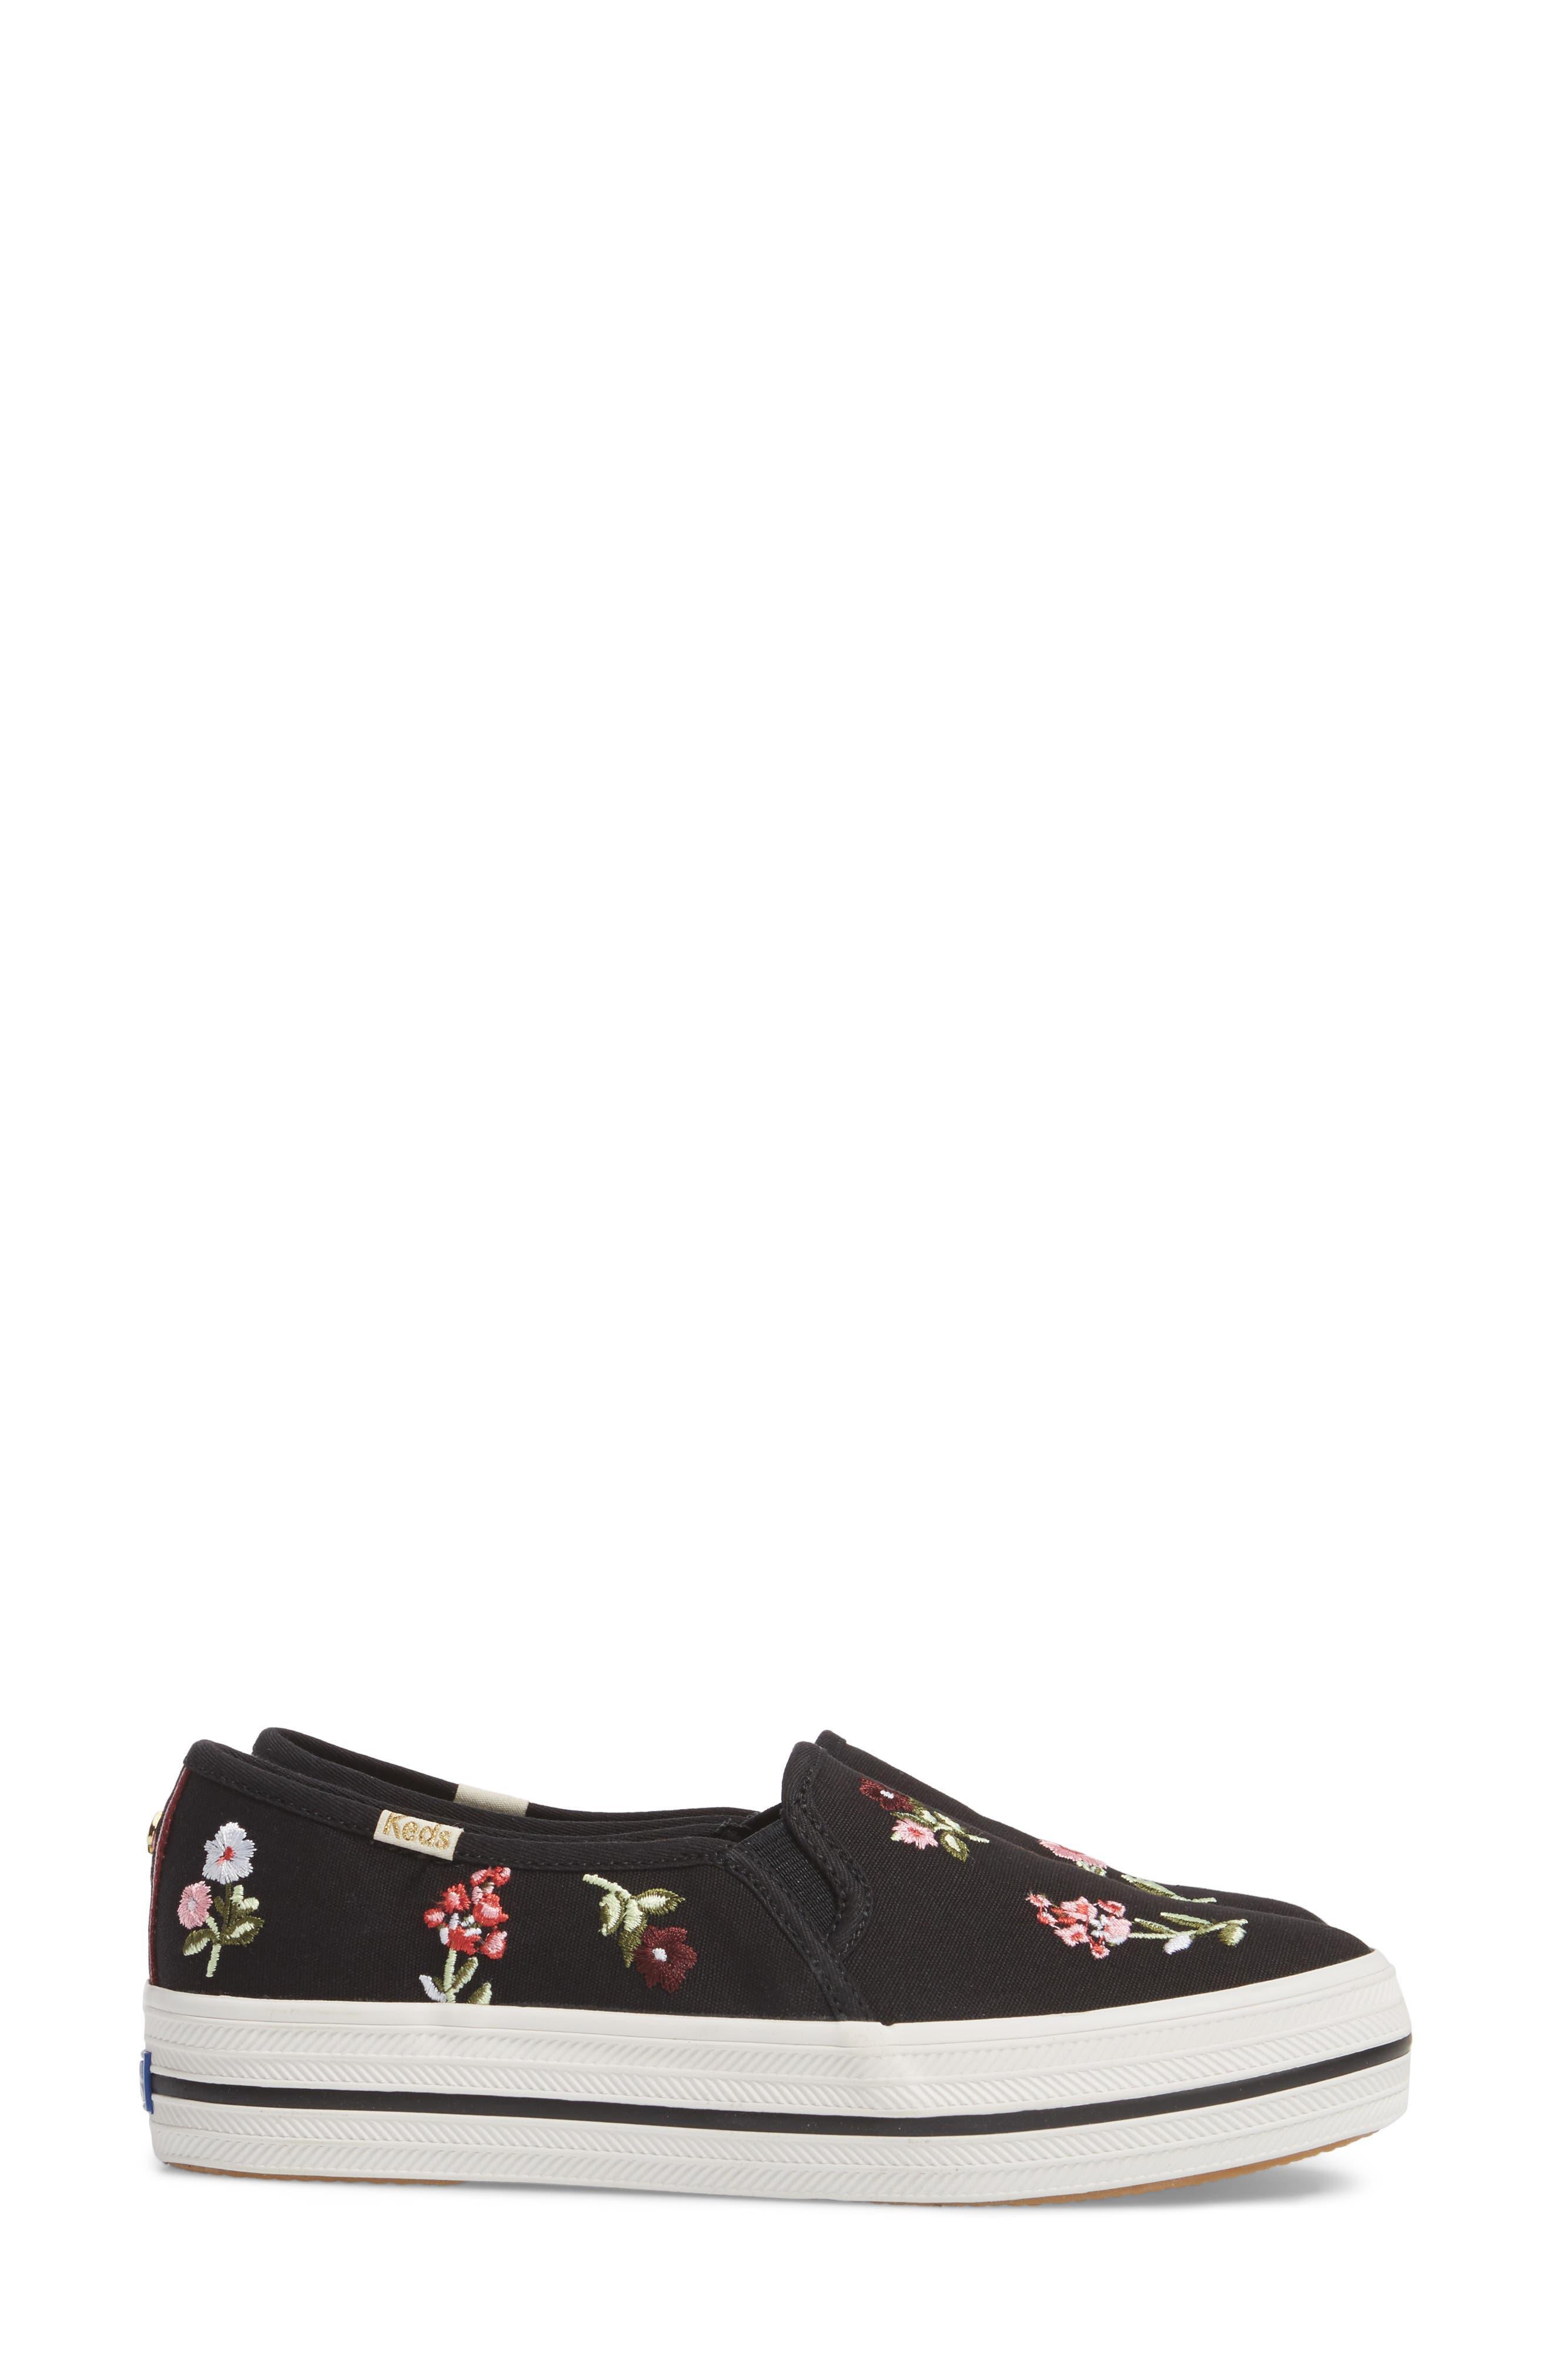 Keds<sup>®</sup> x kate spade Triple Decker Slip-On Sneaker,                             Alternate thumbnail 6, color,